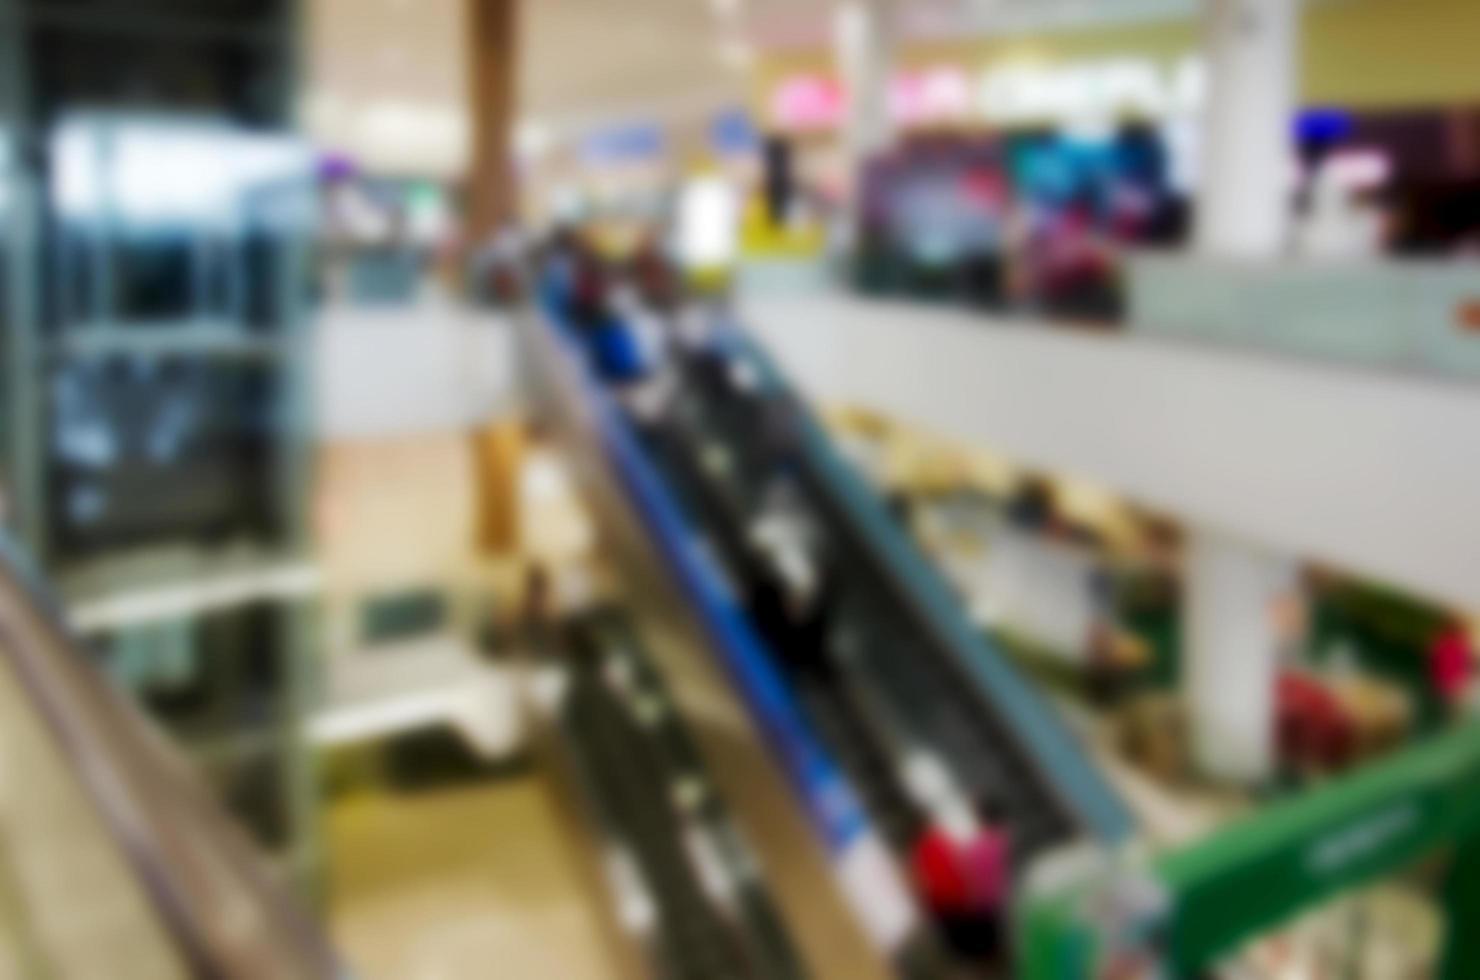 wazige winkelcentrum achtergrond foto